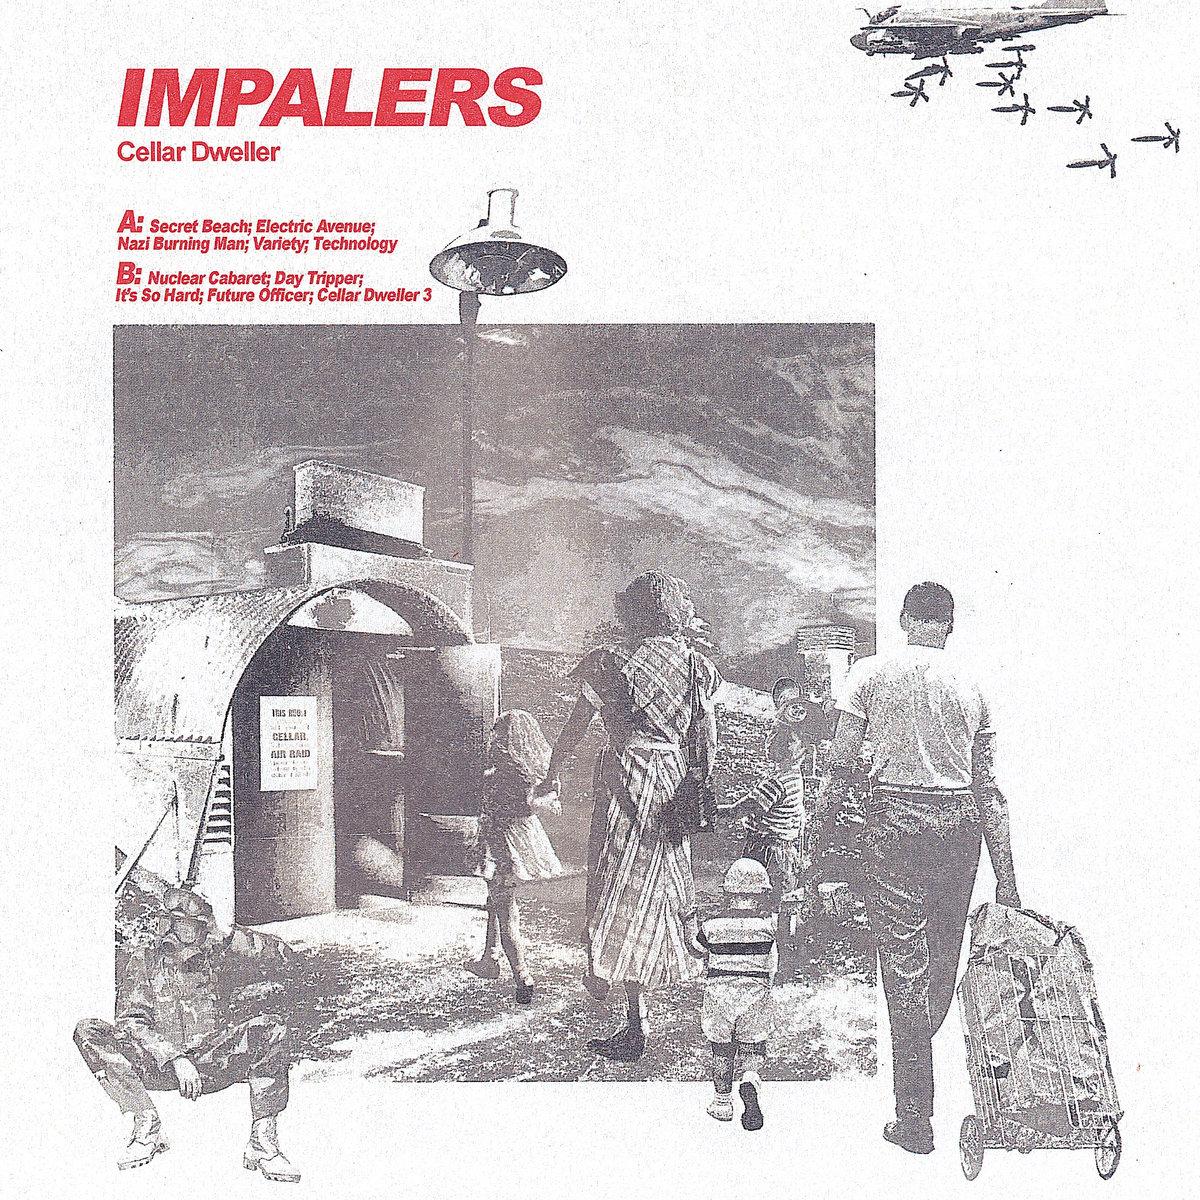 the impalers cellar dweller